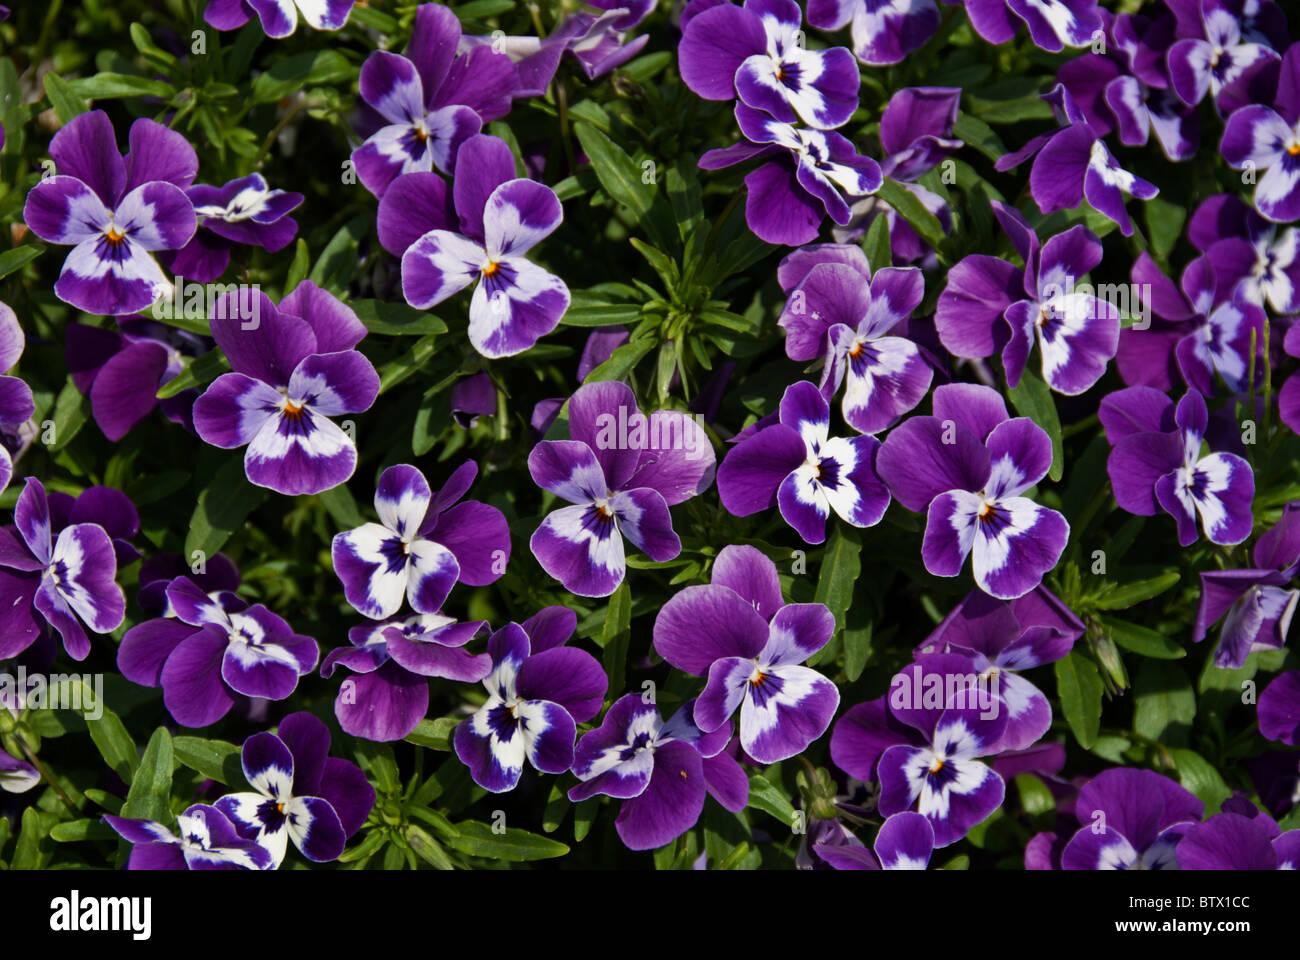 Blue and white pansies (Viola tricolor hortensis) flowering in an en masse planting. - Stock Image